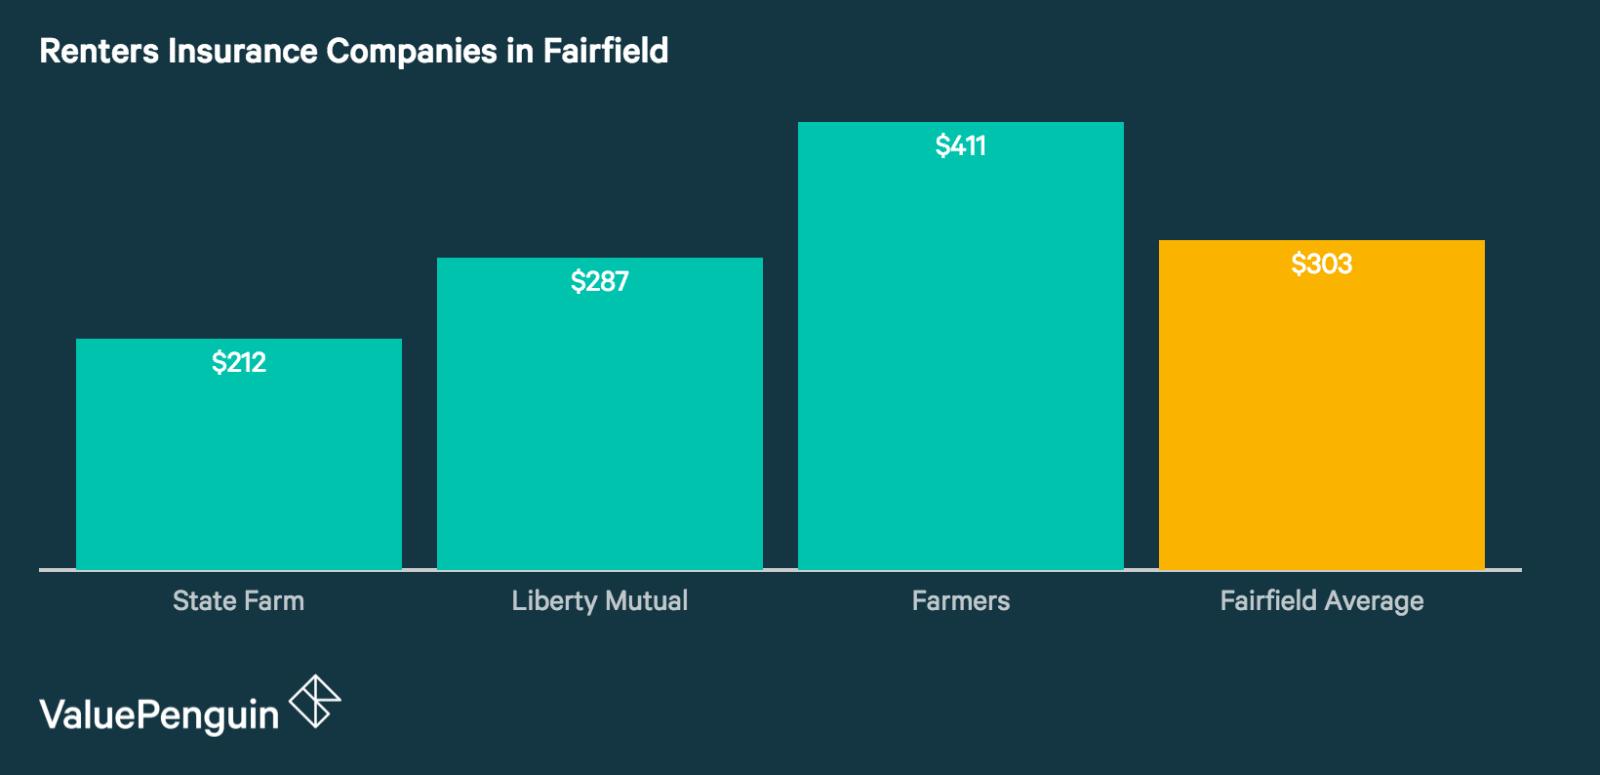 Best Renters Insurance Companies in Fairfield